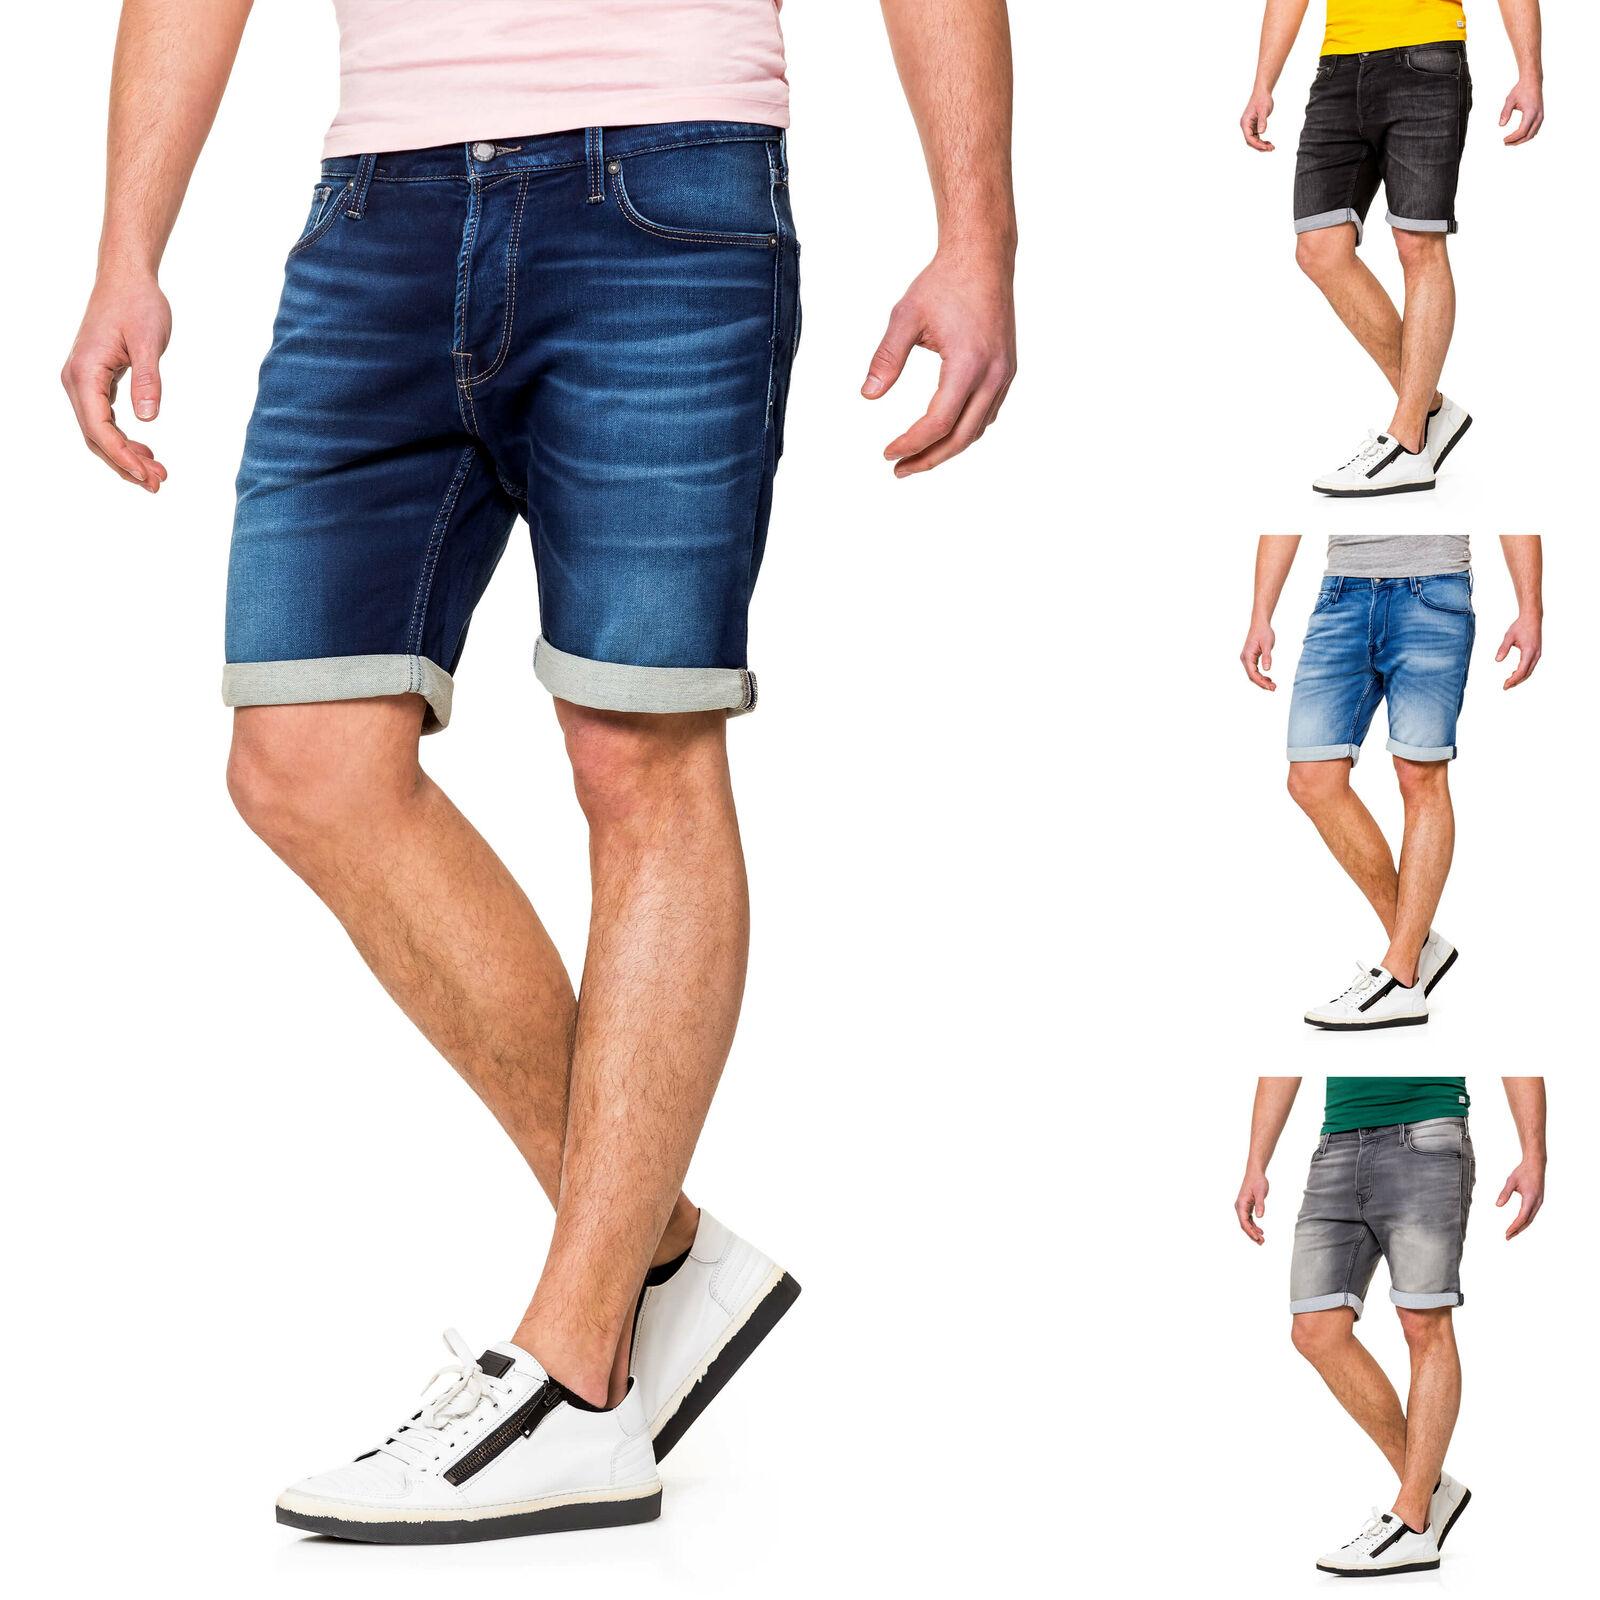 Jack & Jones Herren Jeans Shorts Bermudas Used Look Kurze Hose Herrenshorts